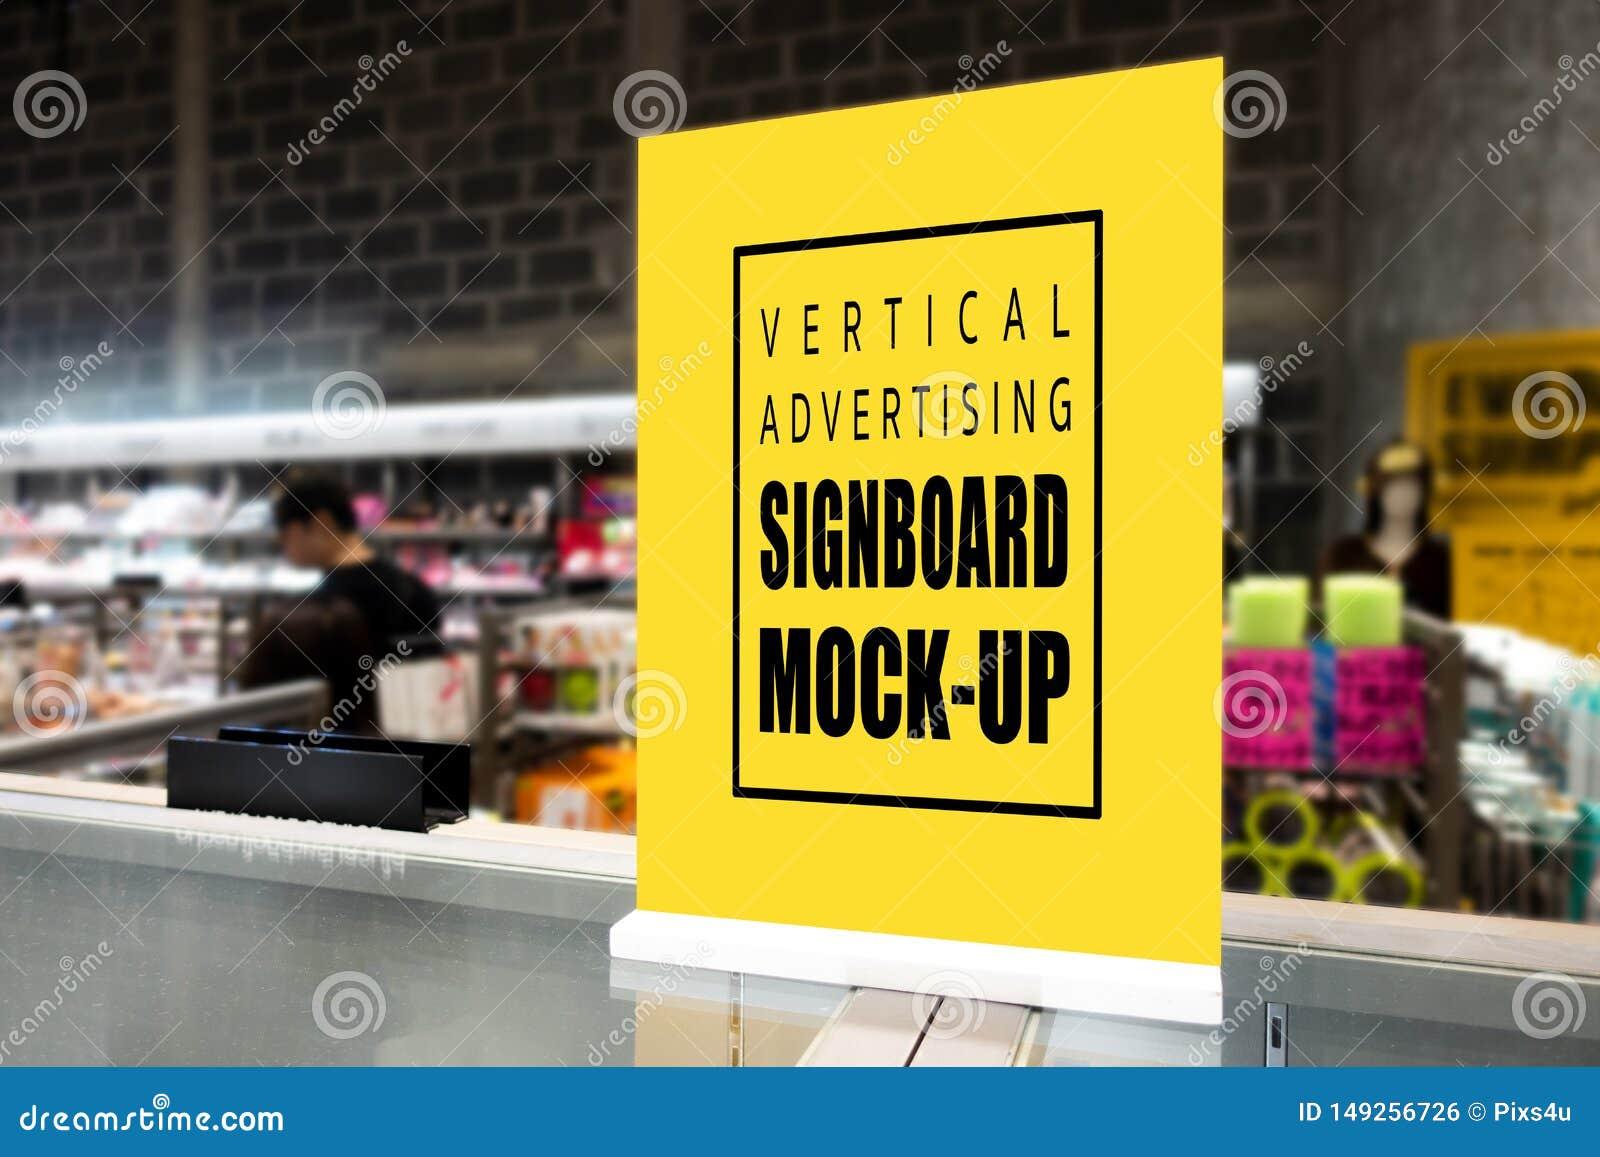 Mock up vertical signboard standing on counter supermarket